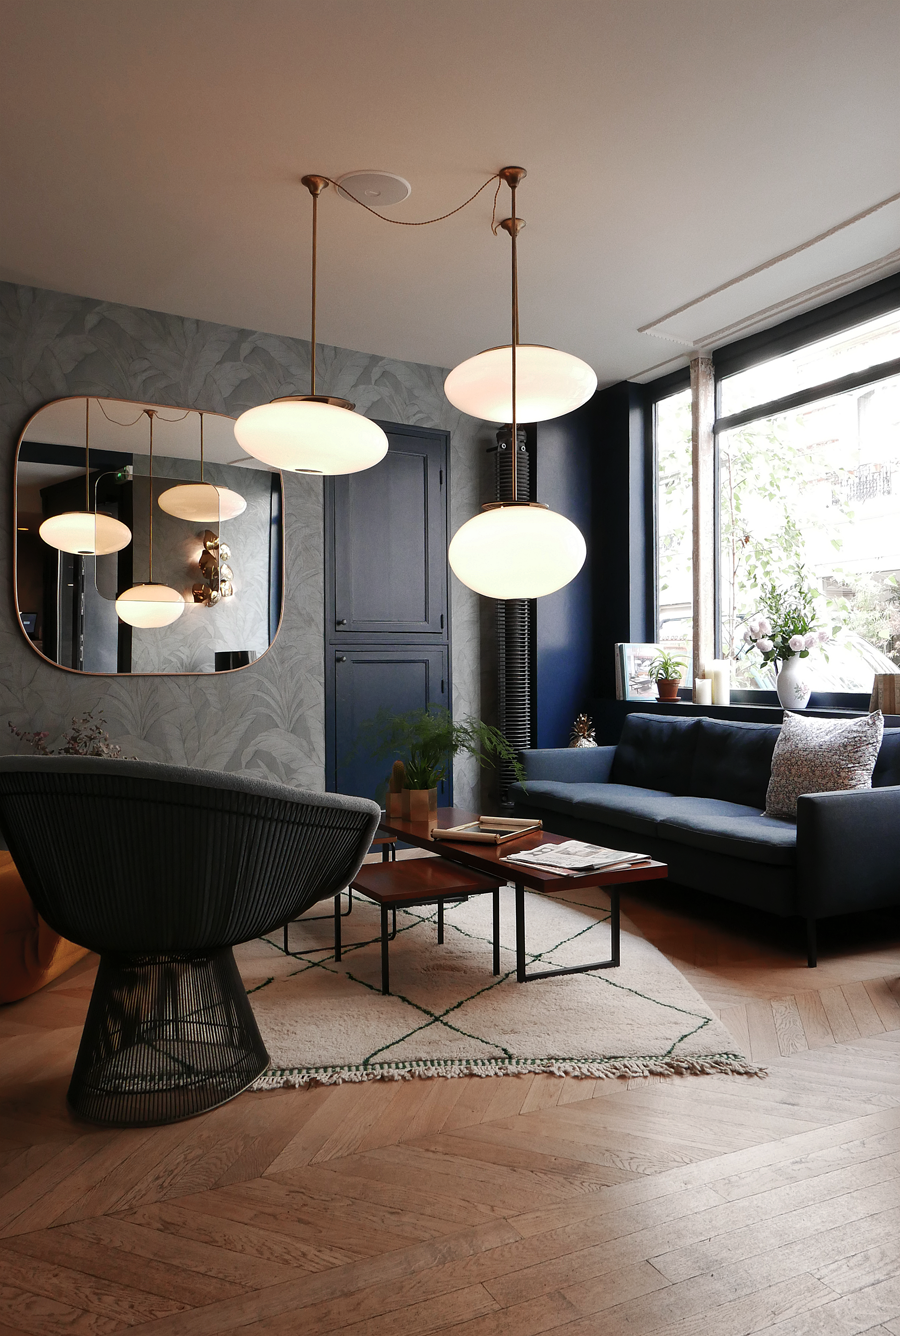 paris hotel henriette elisabeth heier visit wwwcontemporarylightingeu for - Compact Hotel Decor